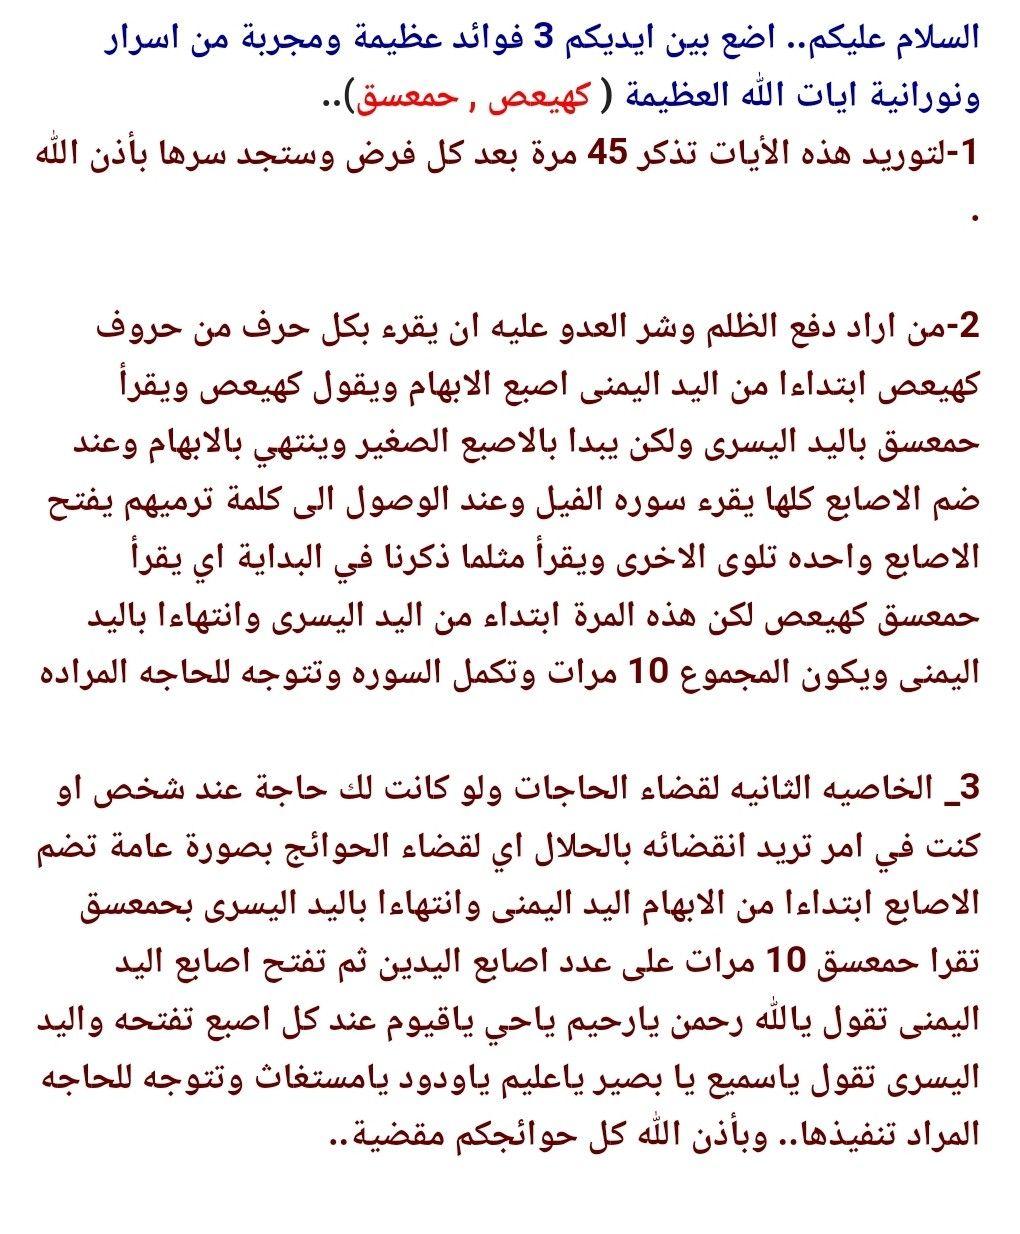 Pin By Michita Bel On Islam Quran Islam Quran Islamic Teachings Islam Hadith